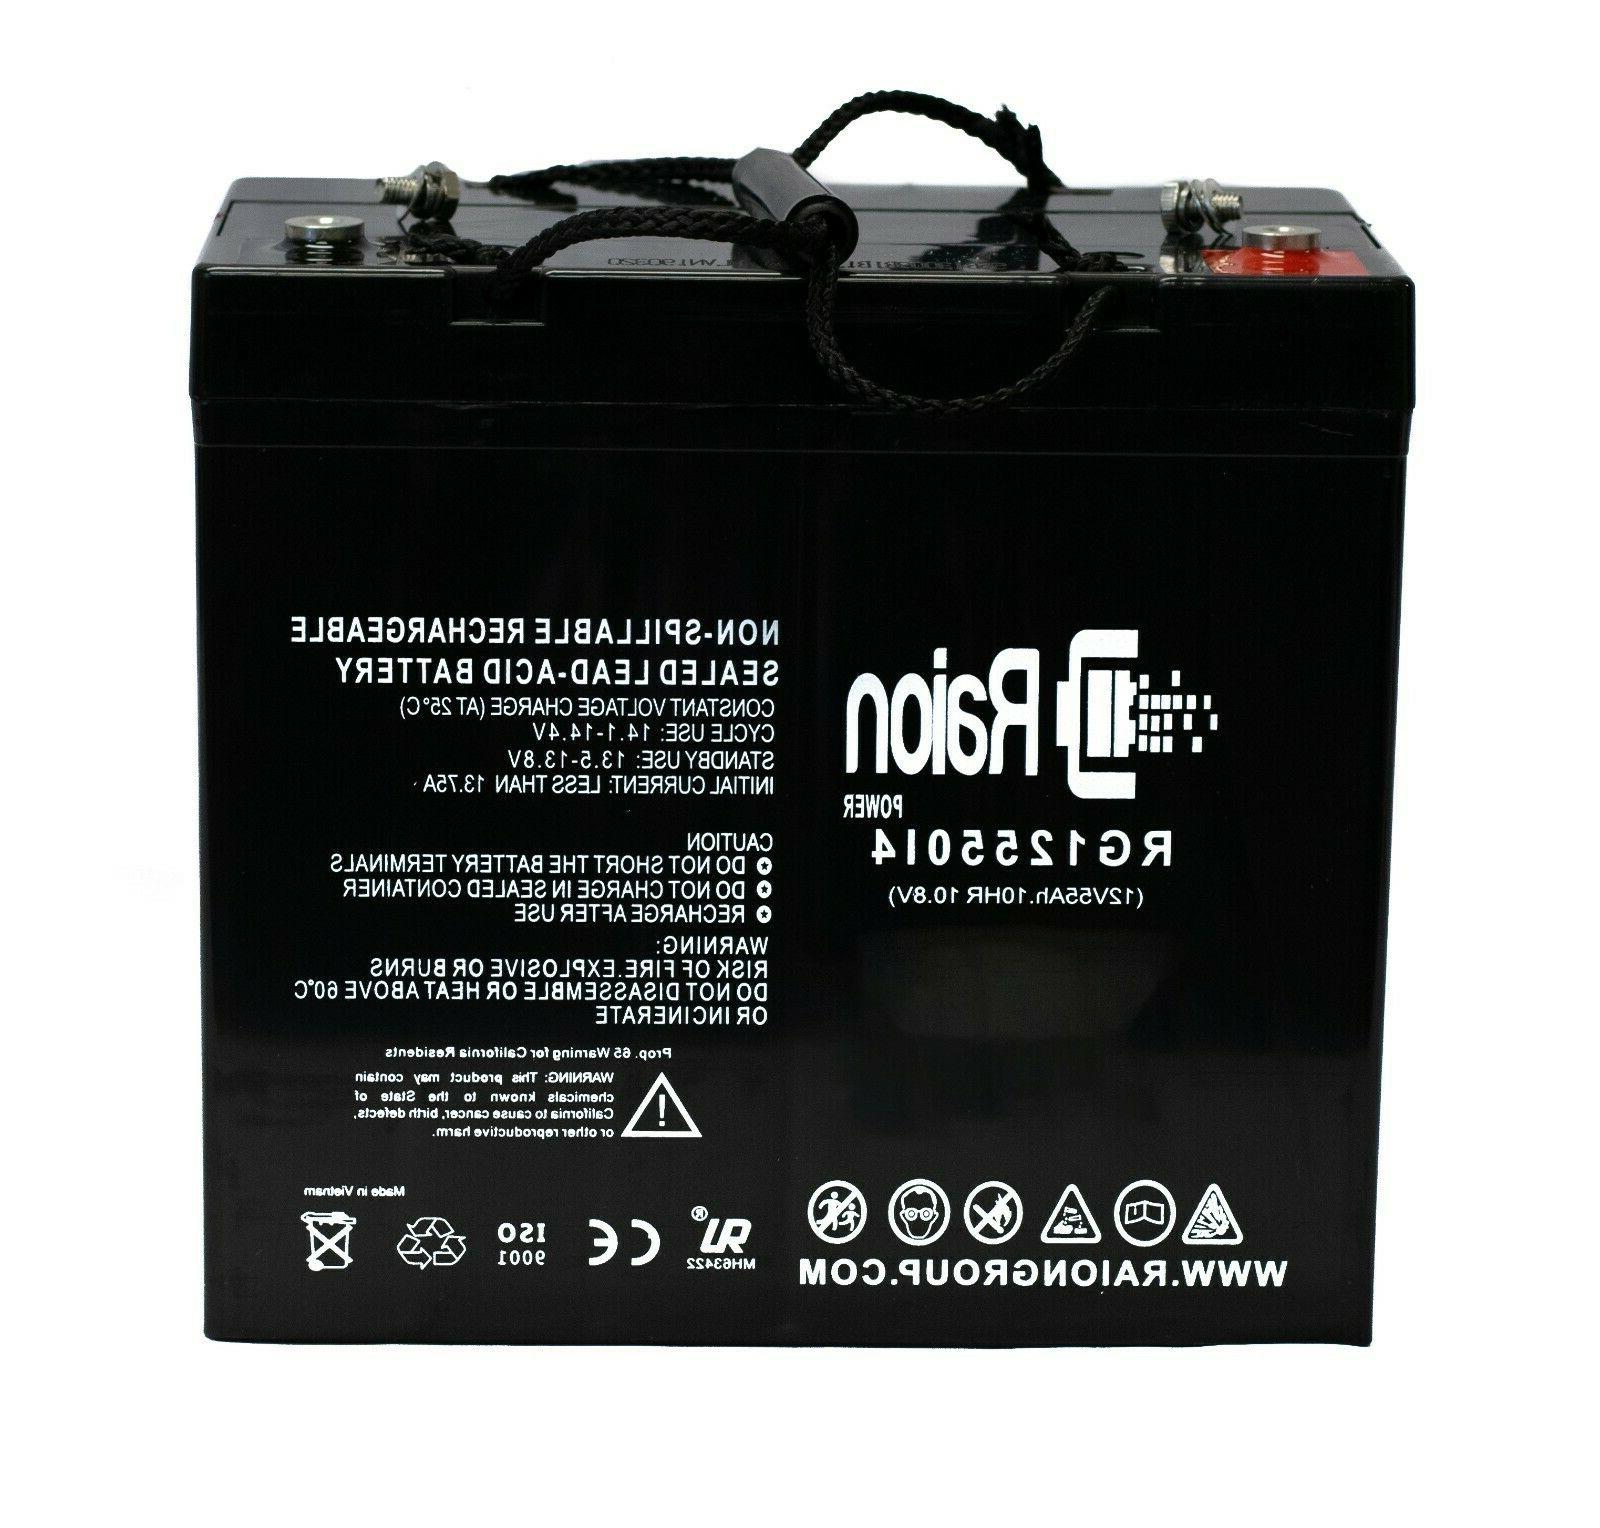 Raion UPG 12V 55Ah Power Trolling Deep Cycle Battery